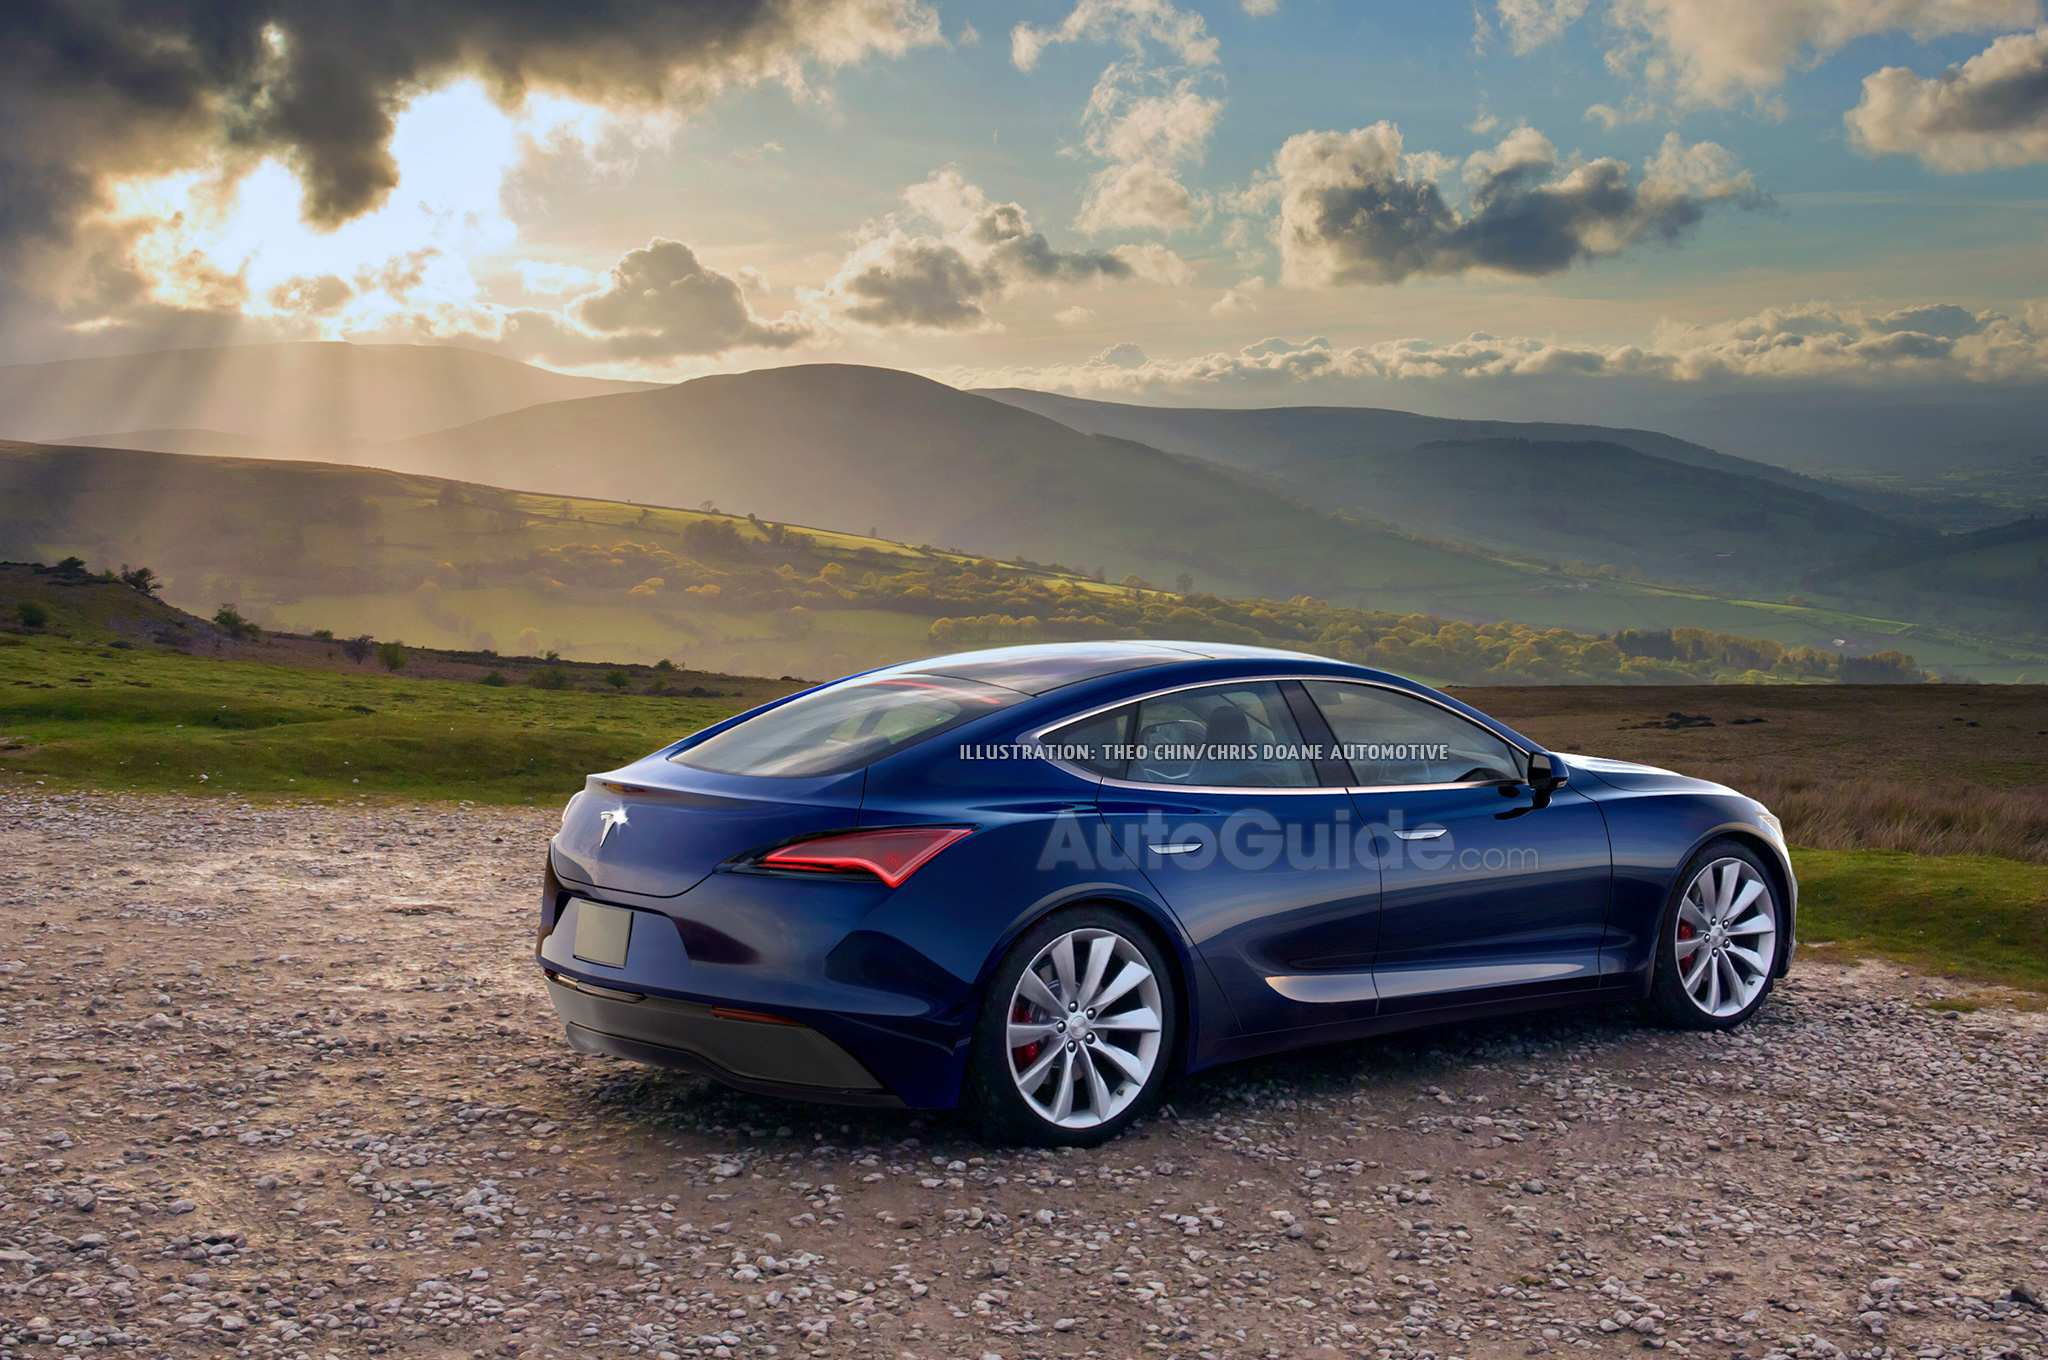 46 All New Tesla S 2020 Spesification by Tesla S 2020